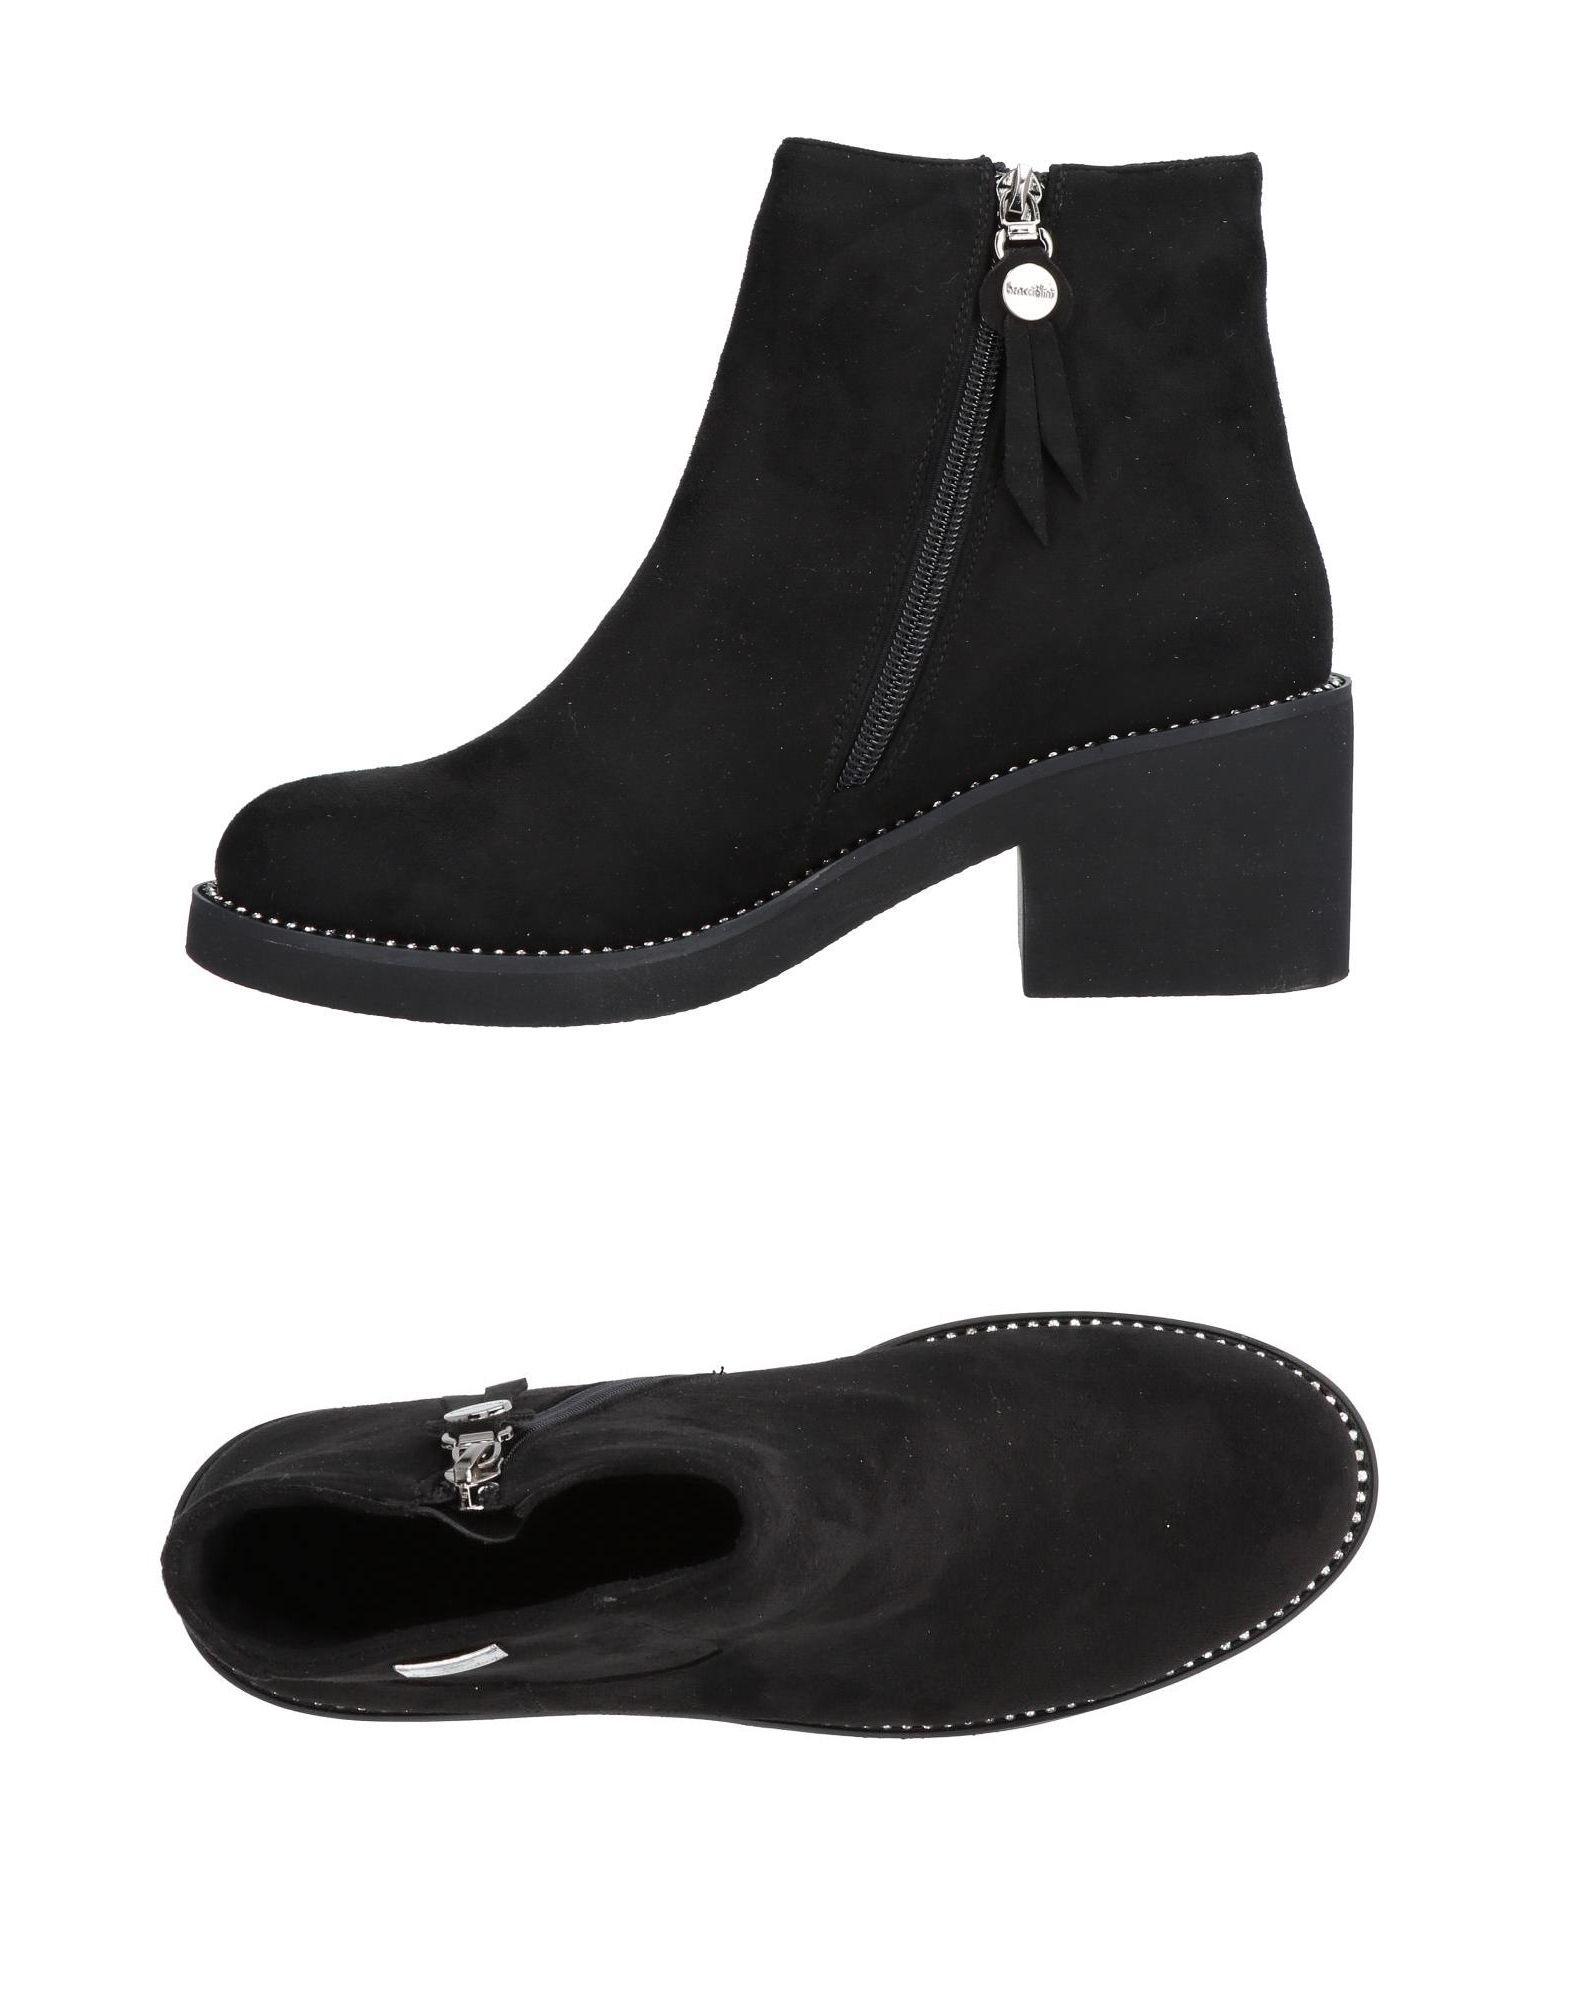 Chelsea Boots Tua By Braccialini 11449117WH Donna - 11449117WH Braccialini c453c3